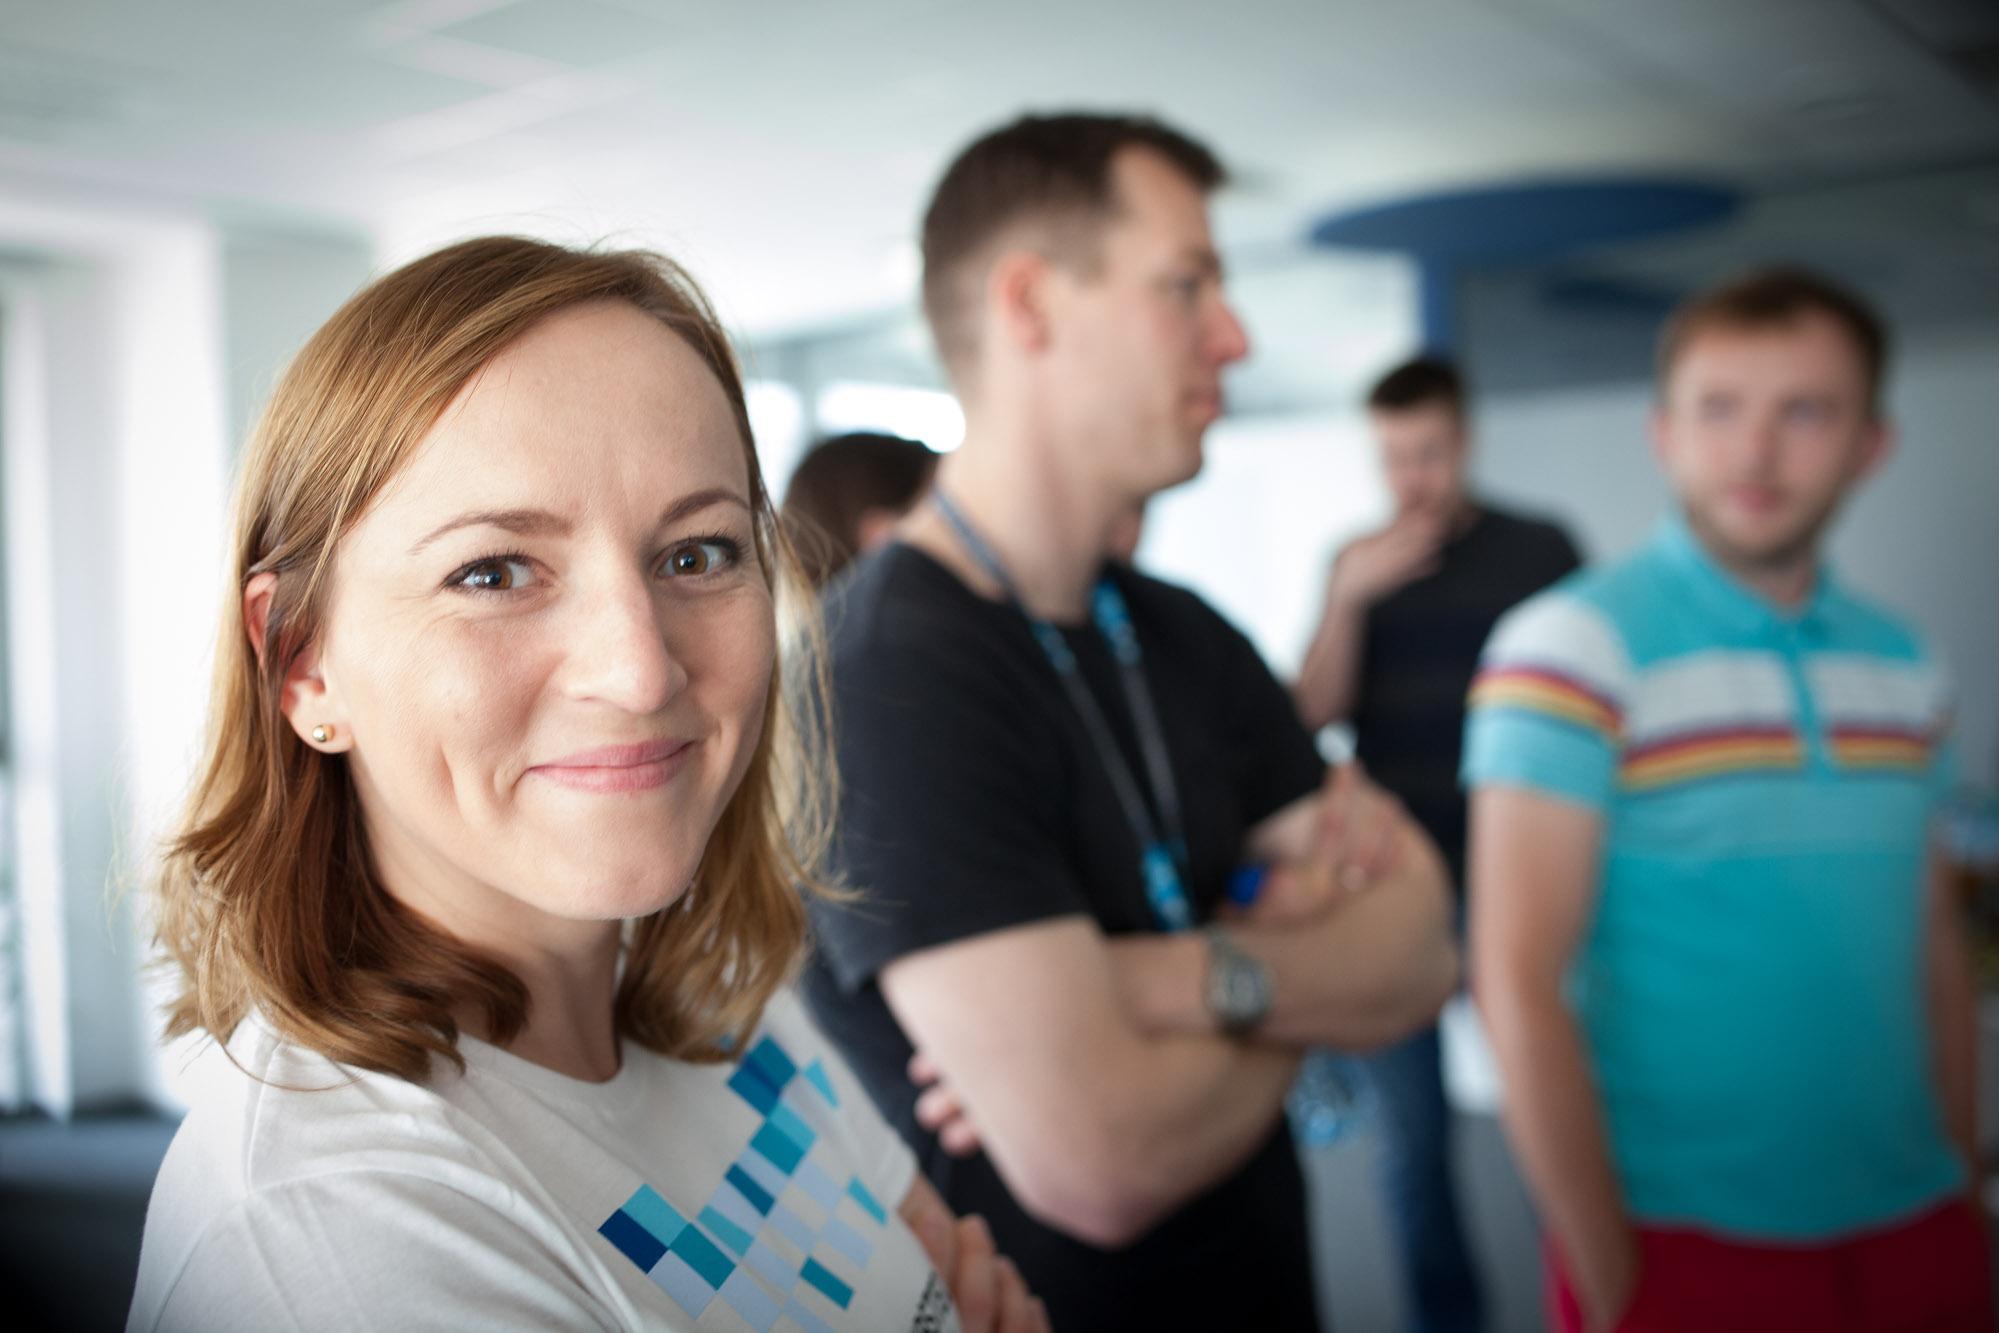 HR Business Partner Aleksandra Grzybowska welcomed the developers to Schibsted Tech Polska´s office